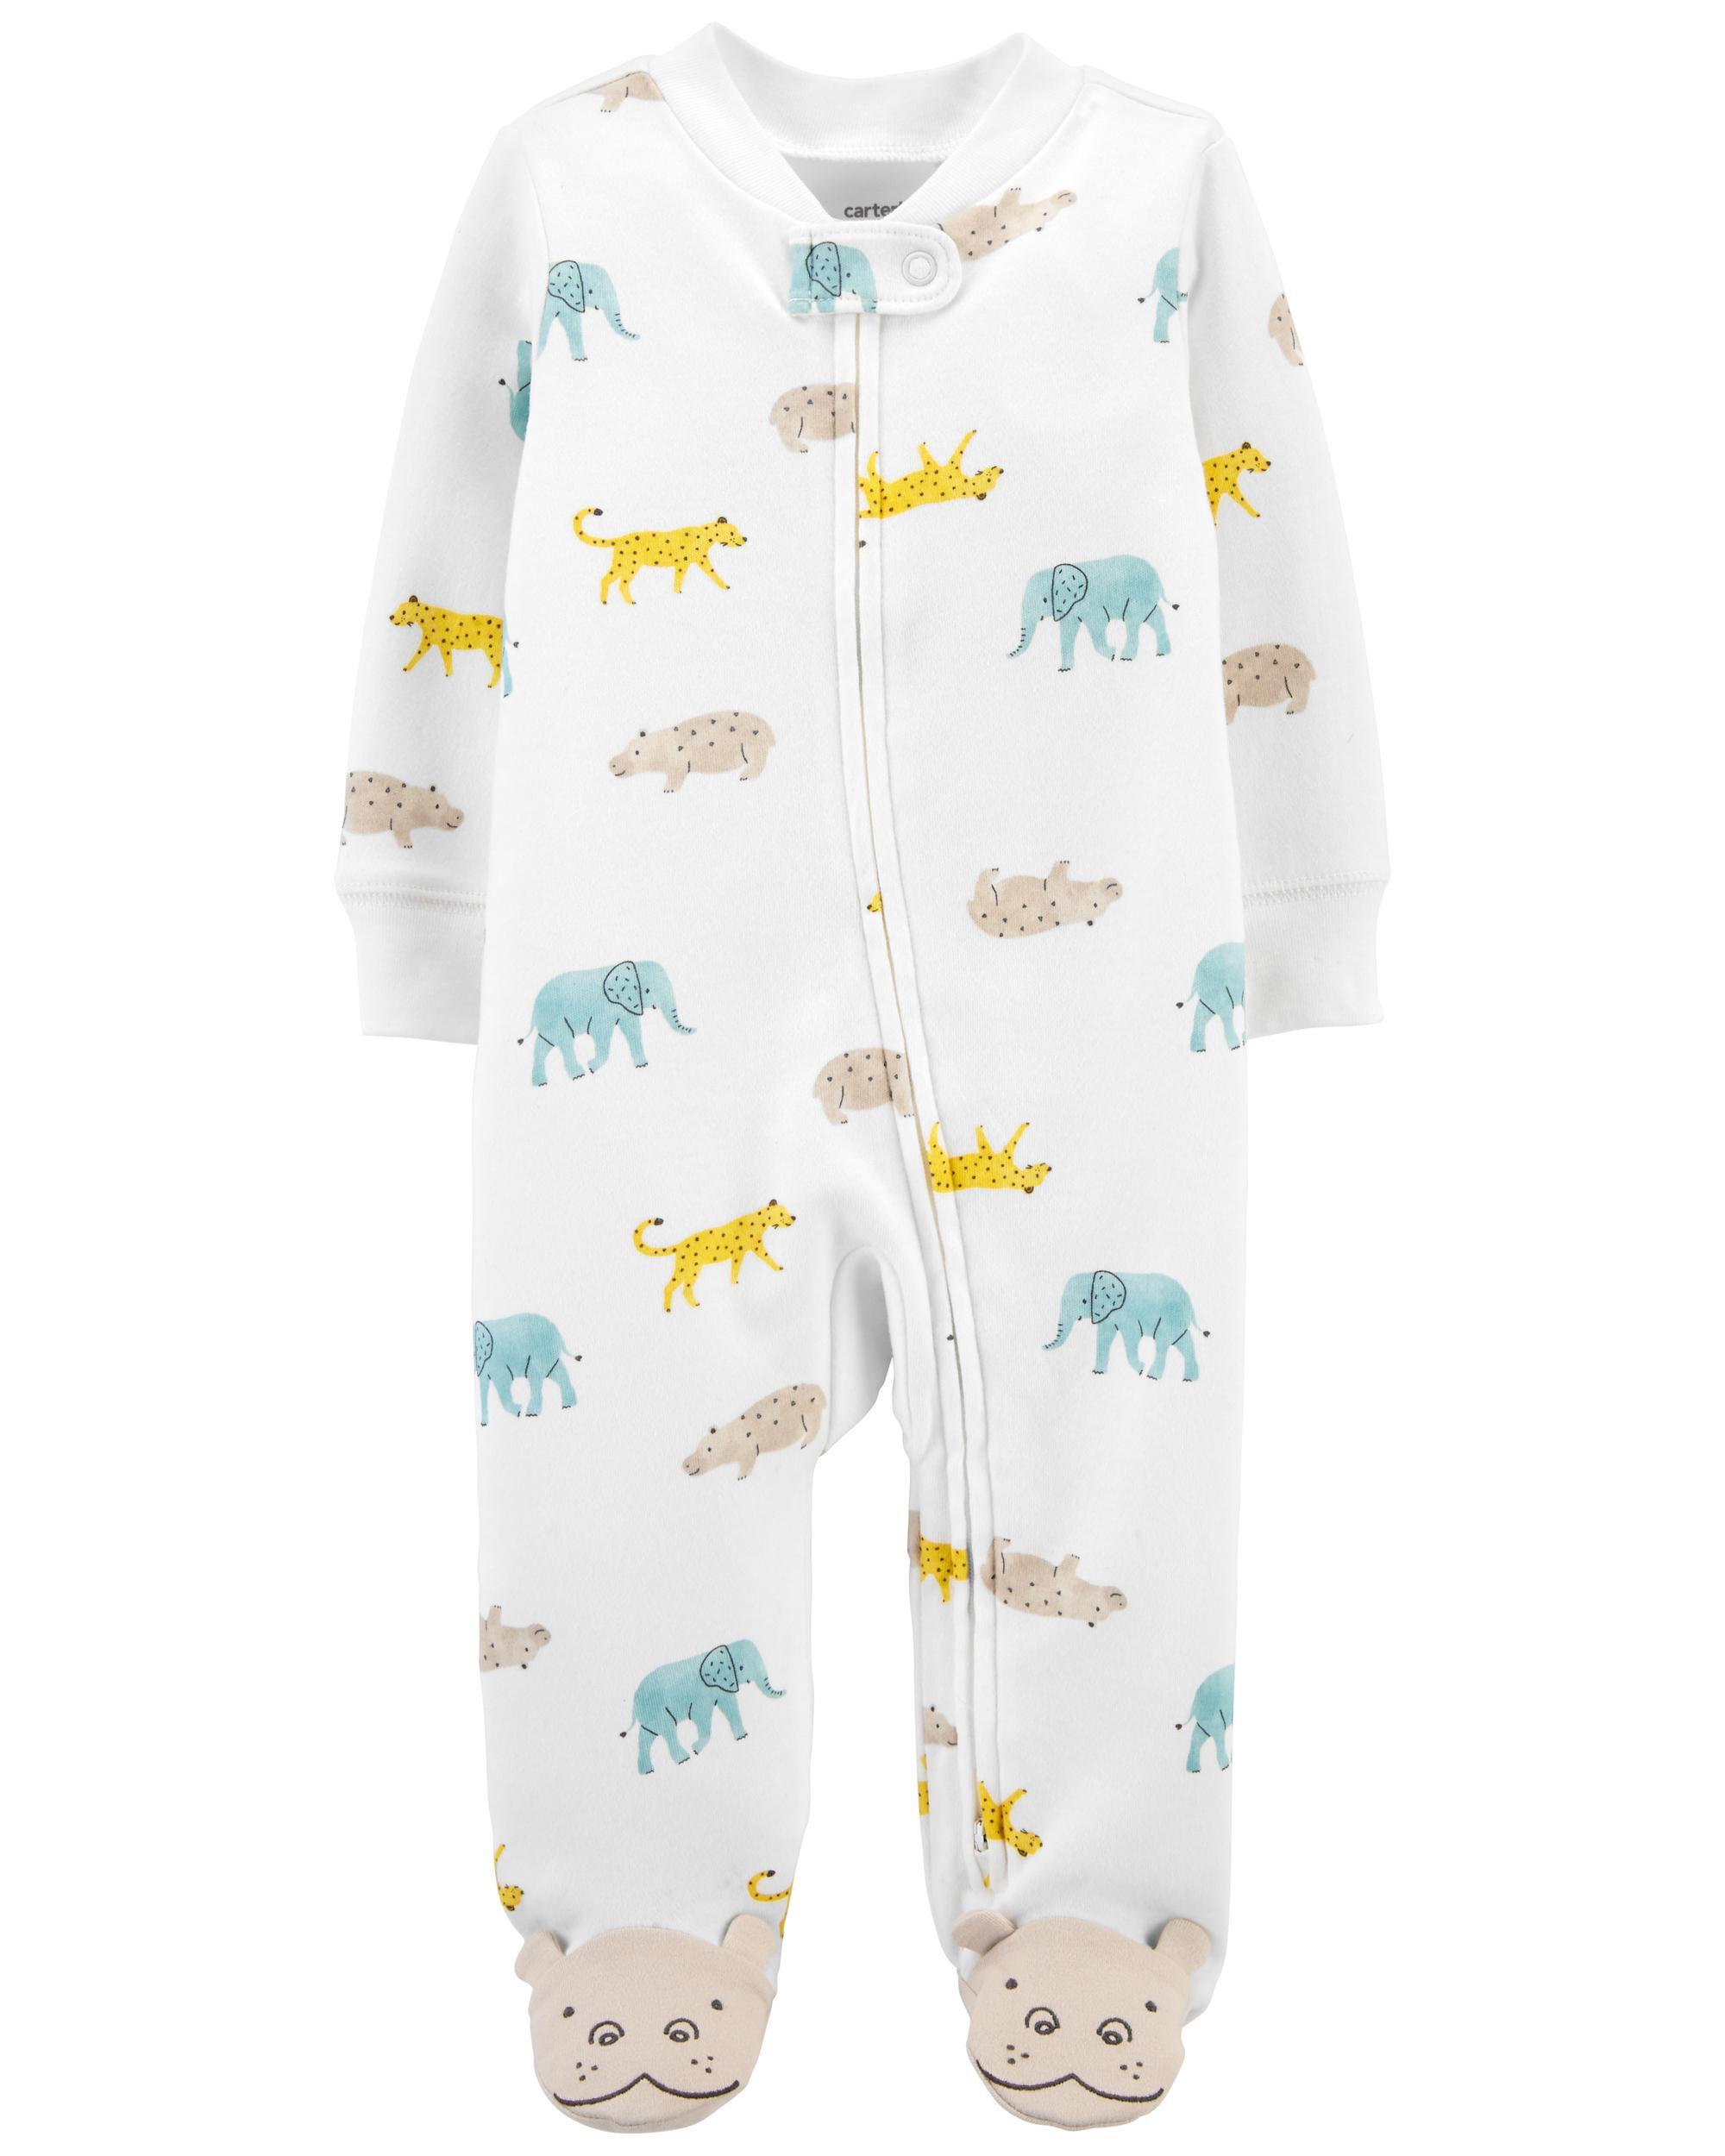 Carters Animal 2-Way Zip Cotton Sleep & Play